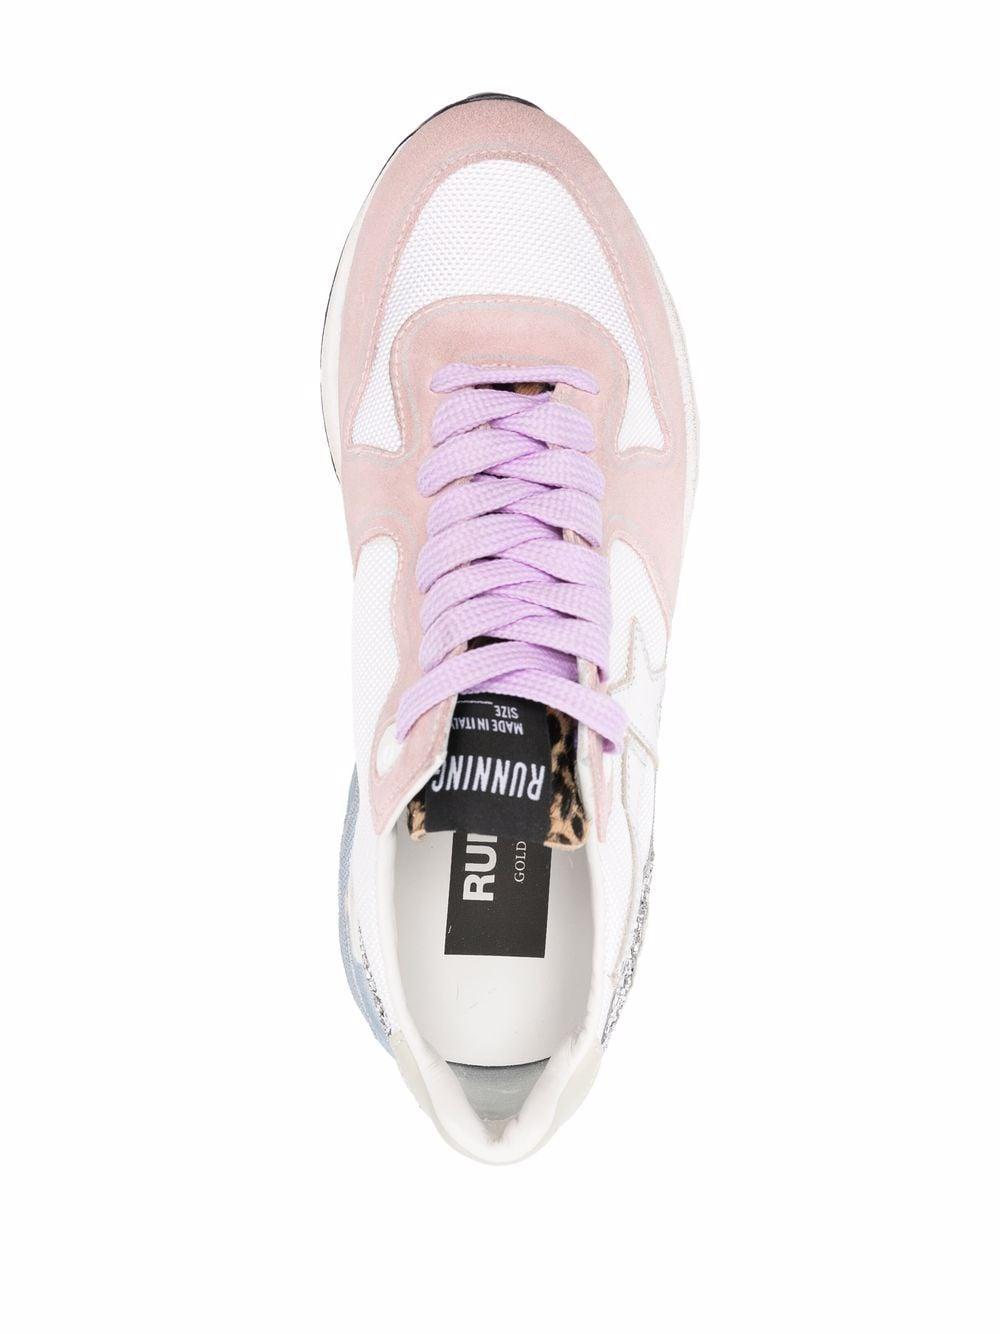 Picture of Golden Goose Deluxe Brand   Running Sole Low-Top Sneakers